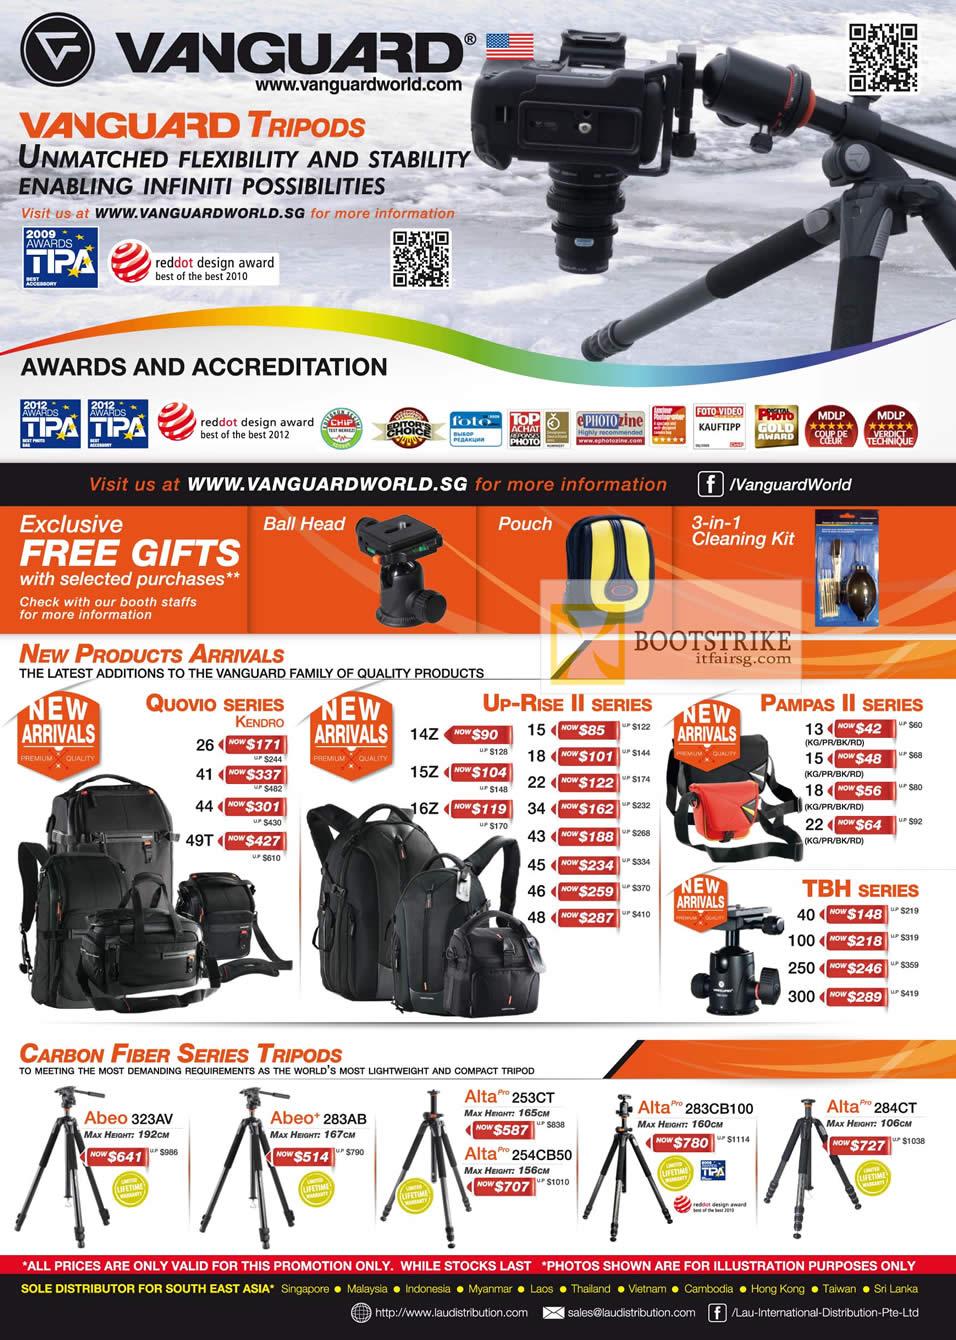 COMEX 2012 price list image brochure of Lau Intl Vanguard Tripods Quovio, Up-Rise II, Pampas II, TBH, Carbon Fiber Abeo, Alta